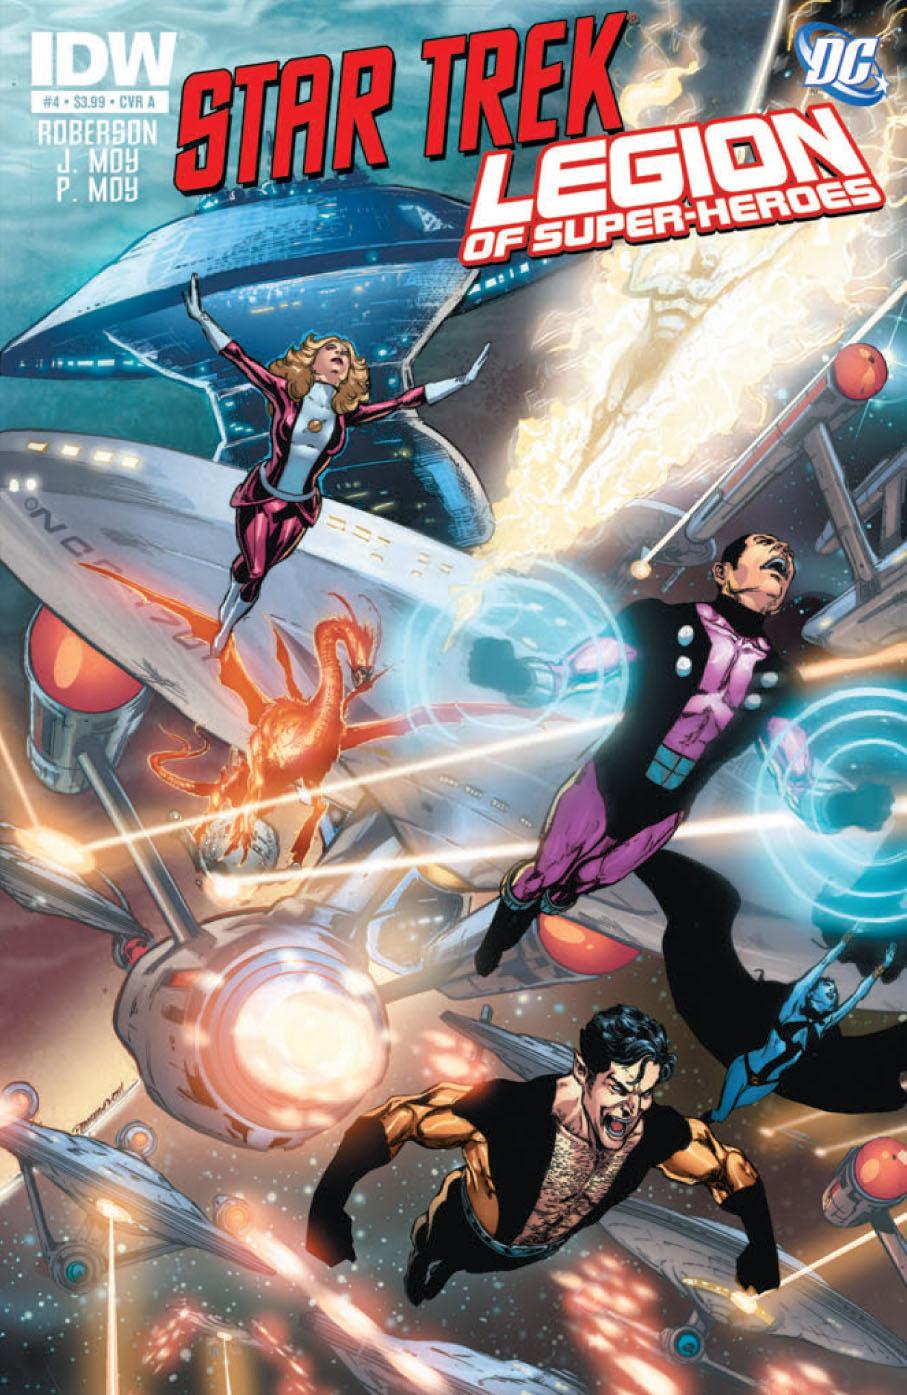 DC Universe Online - Superheroes or supervillains? Dreadnought